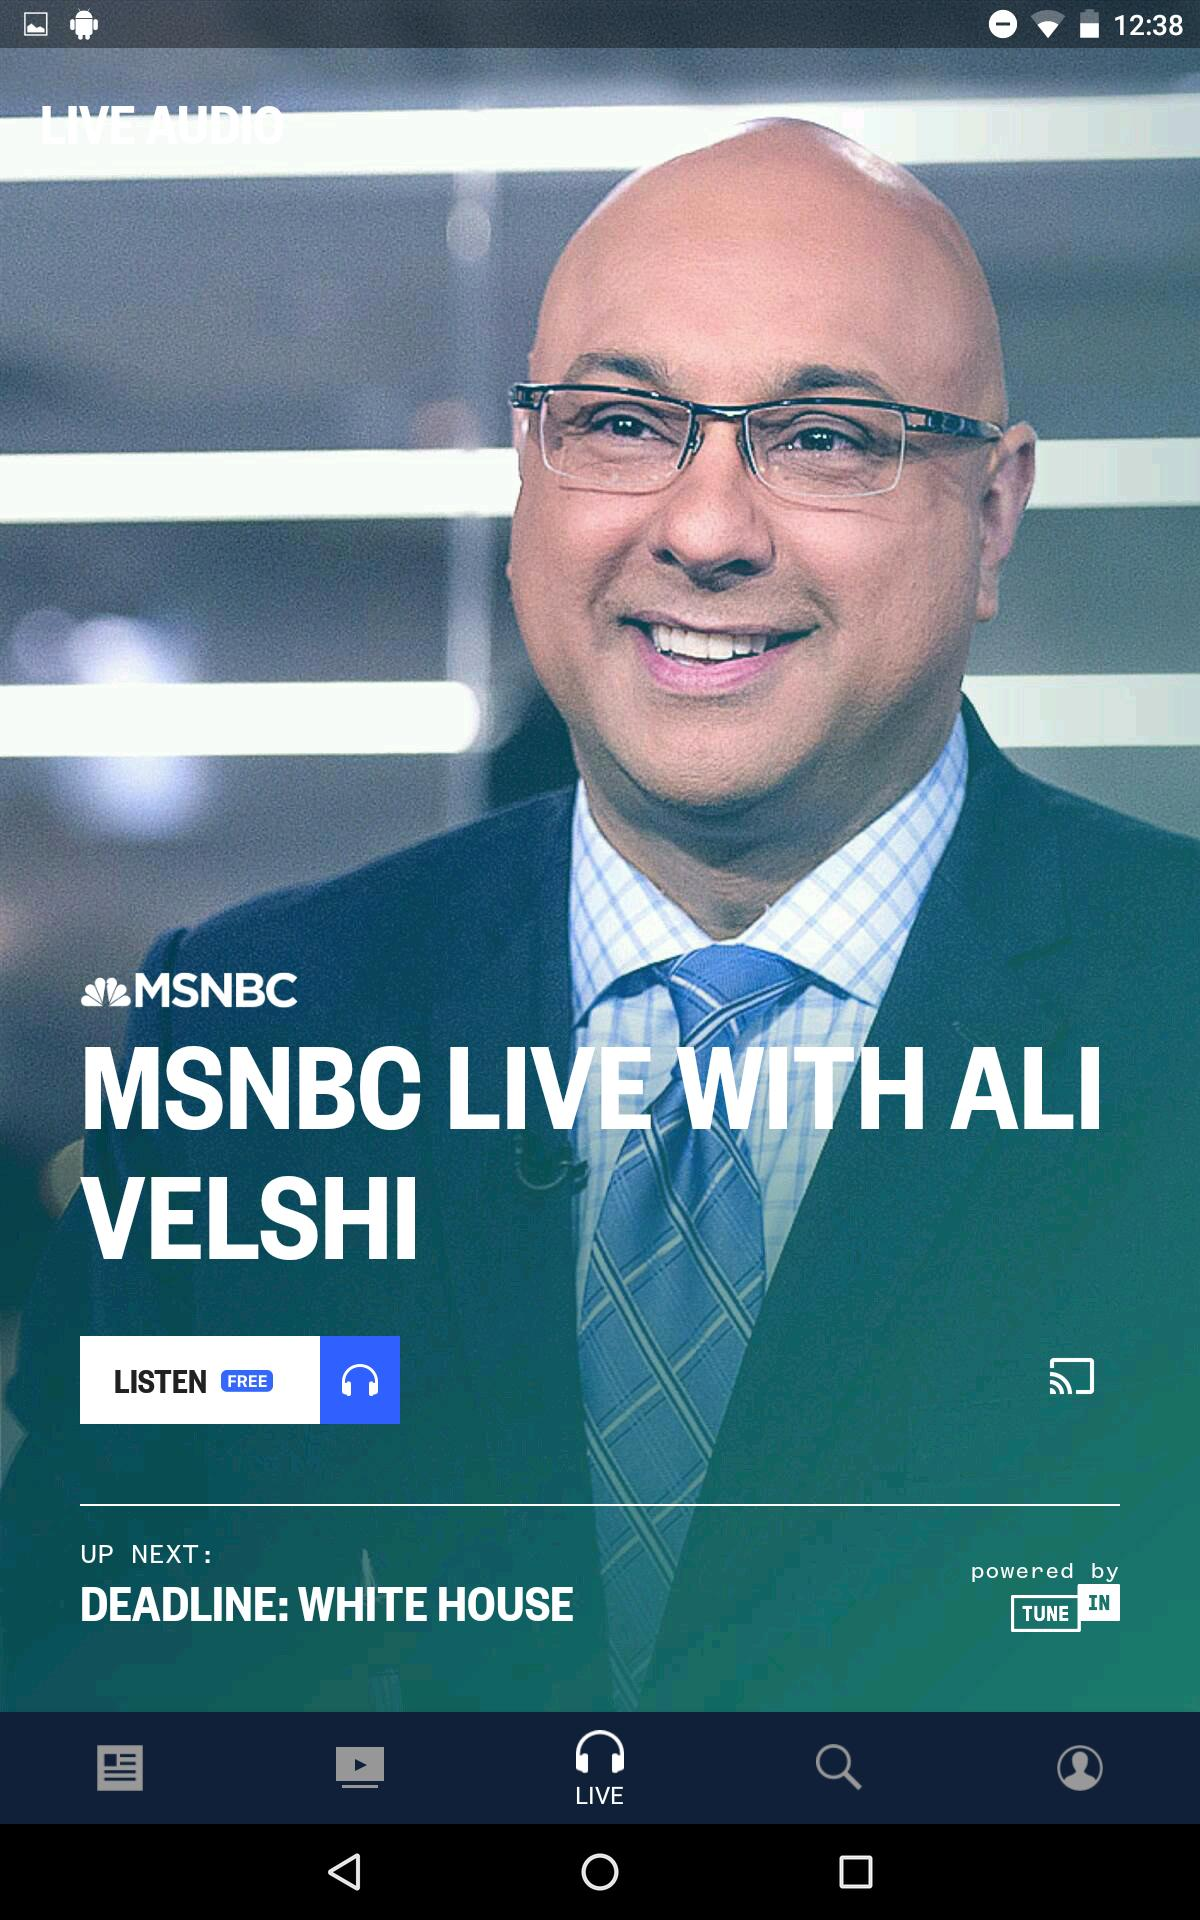 NBC News: Breaking News, US News & Live Video 6.0.11 Screenshot 14